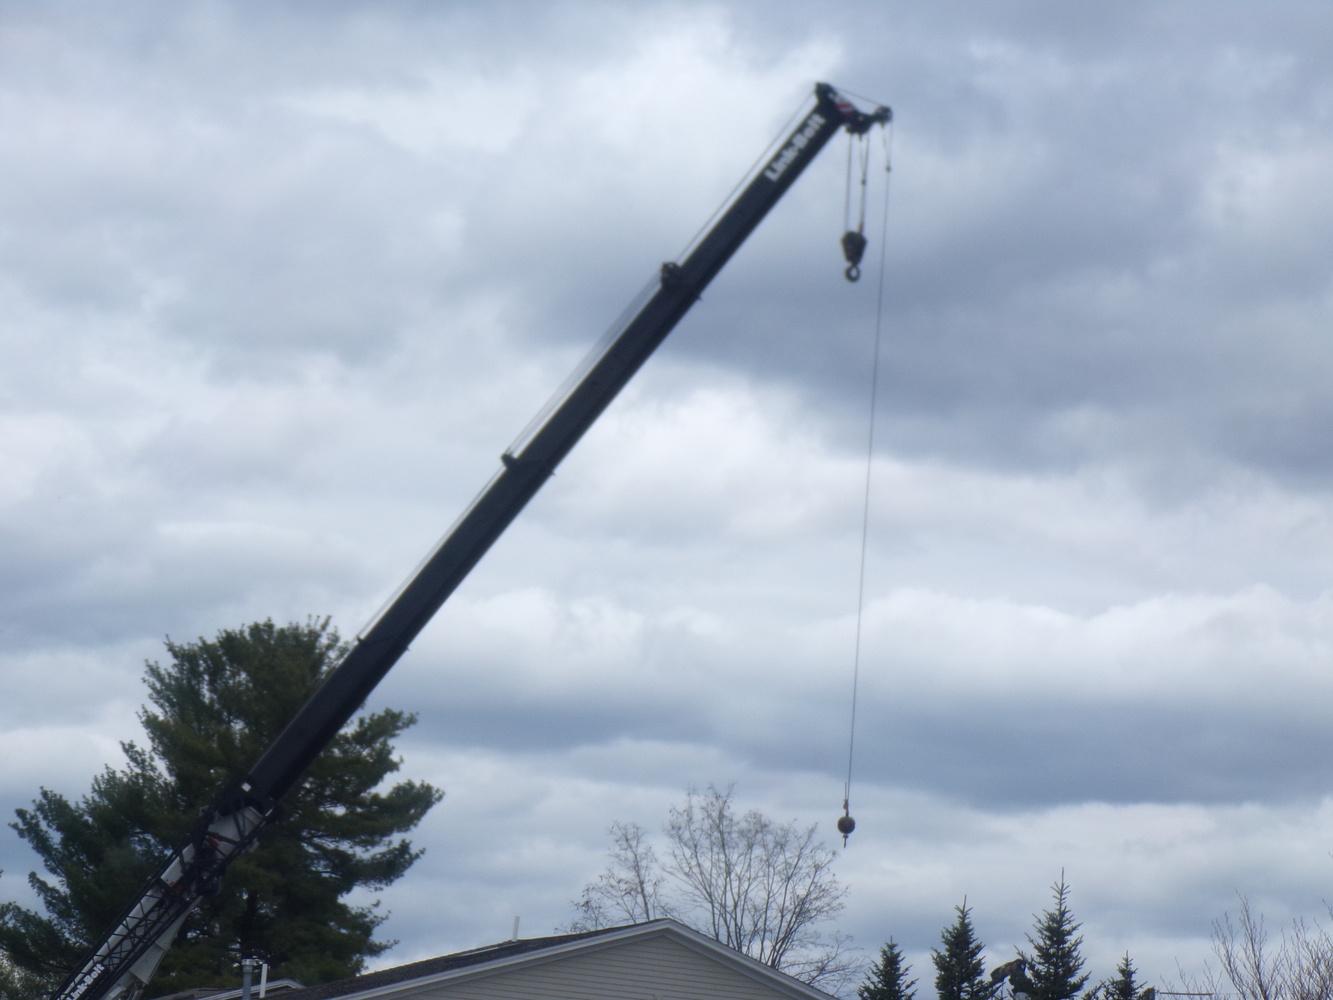 Crane in the Sky by Tammy Higgins